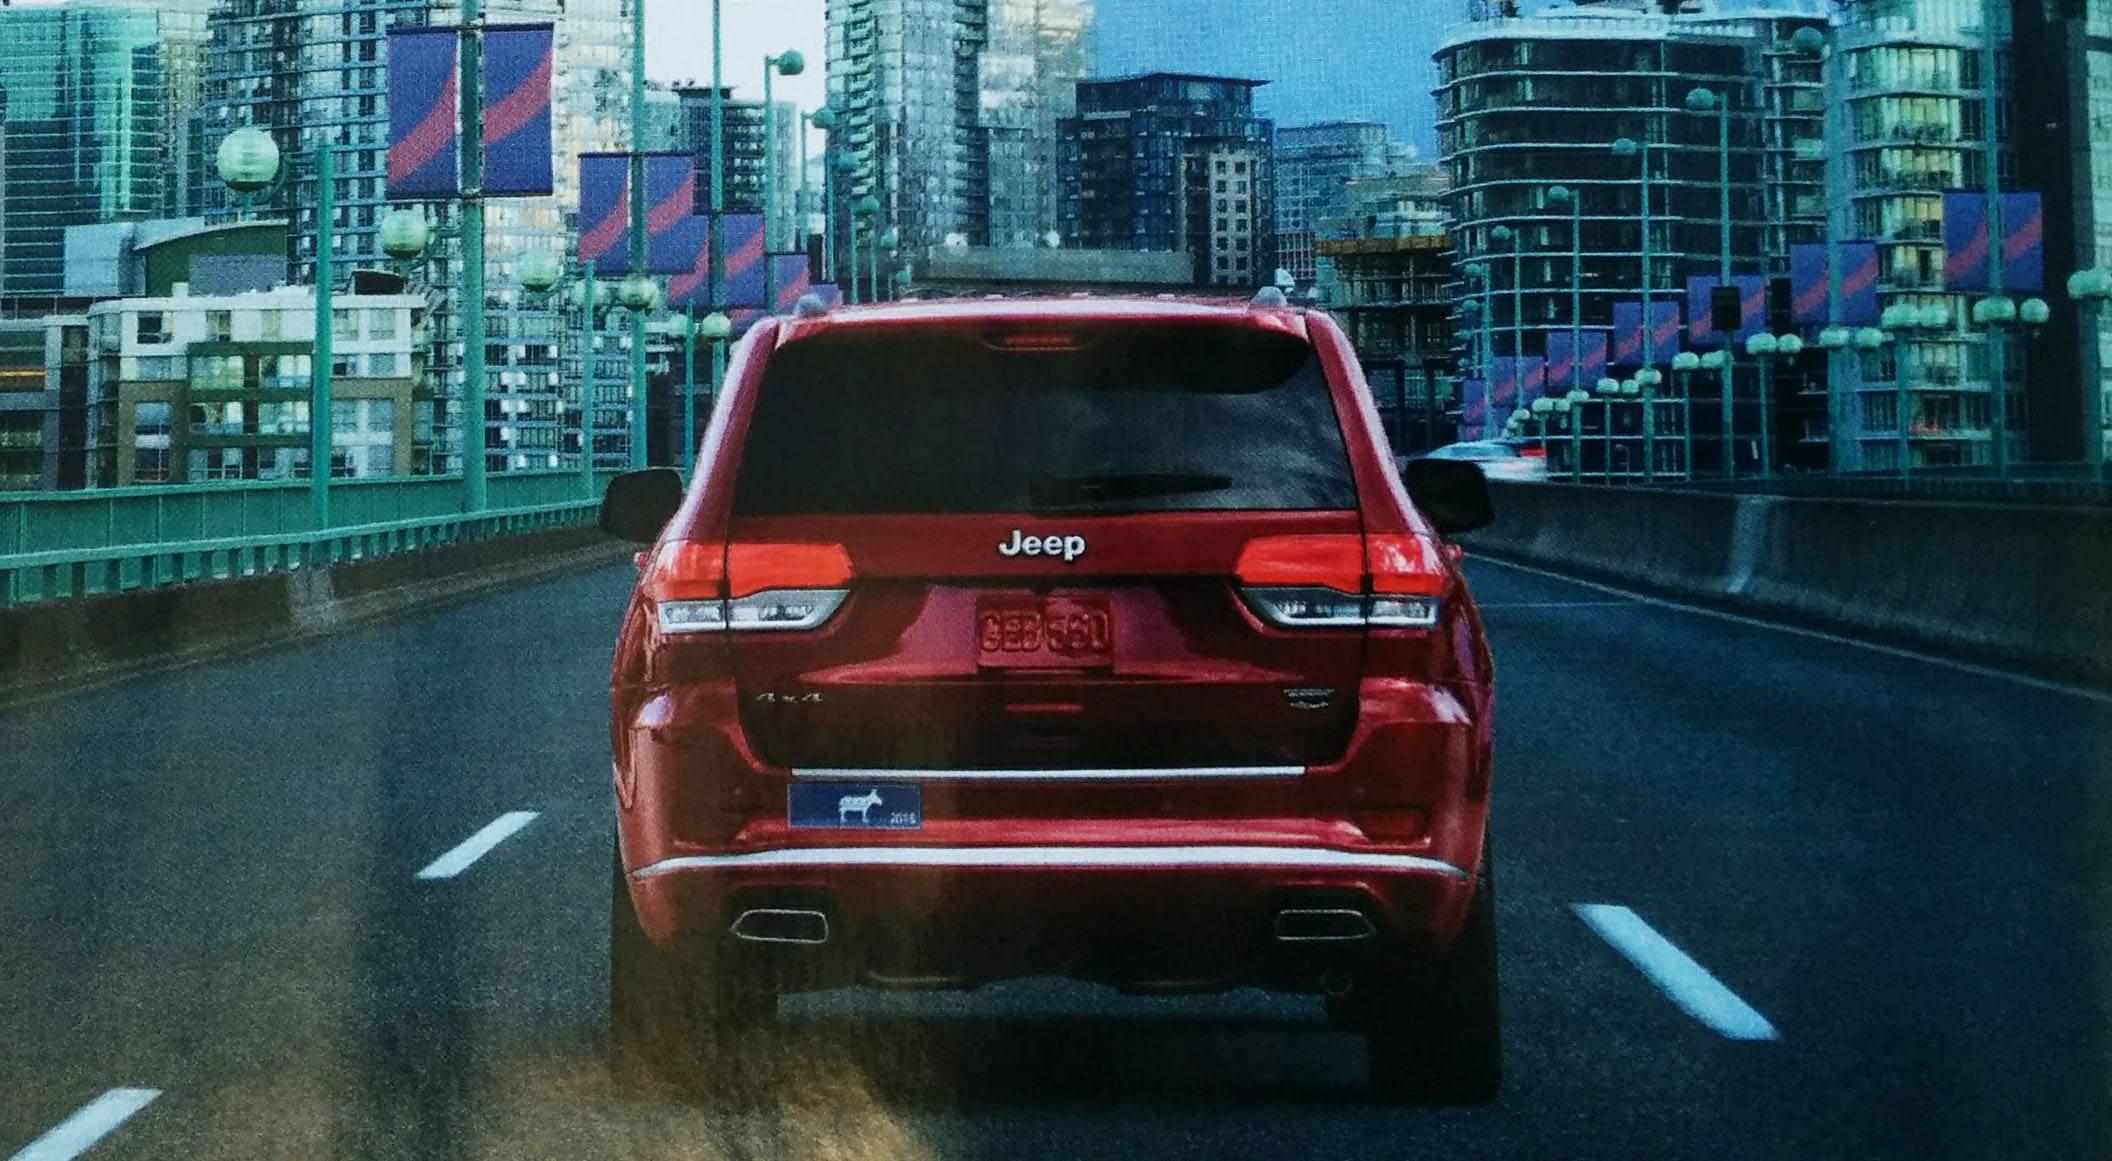 Jeep ad feature vanity fair